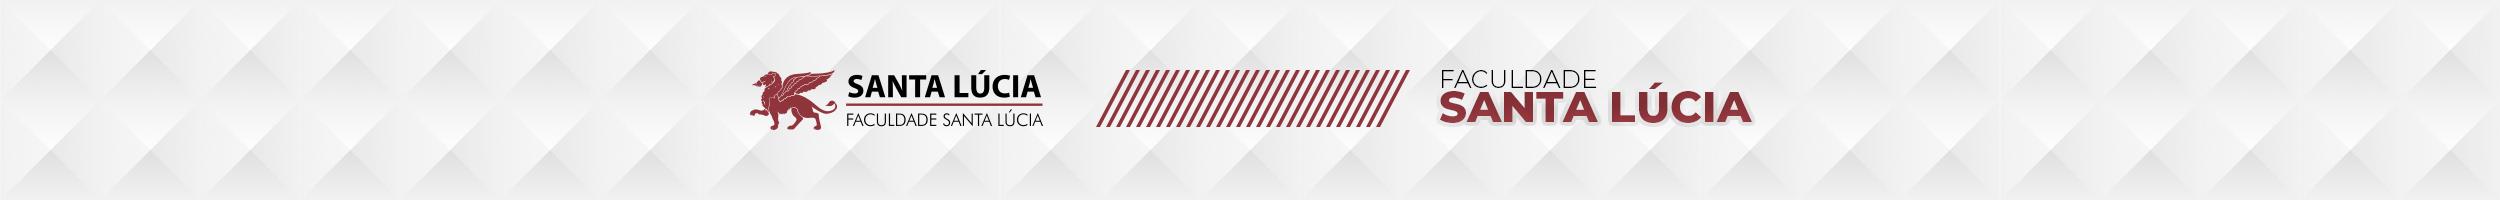 banner-santalucia